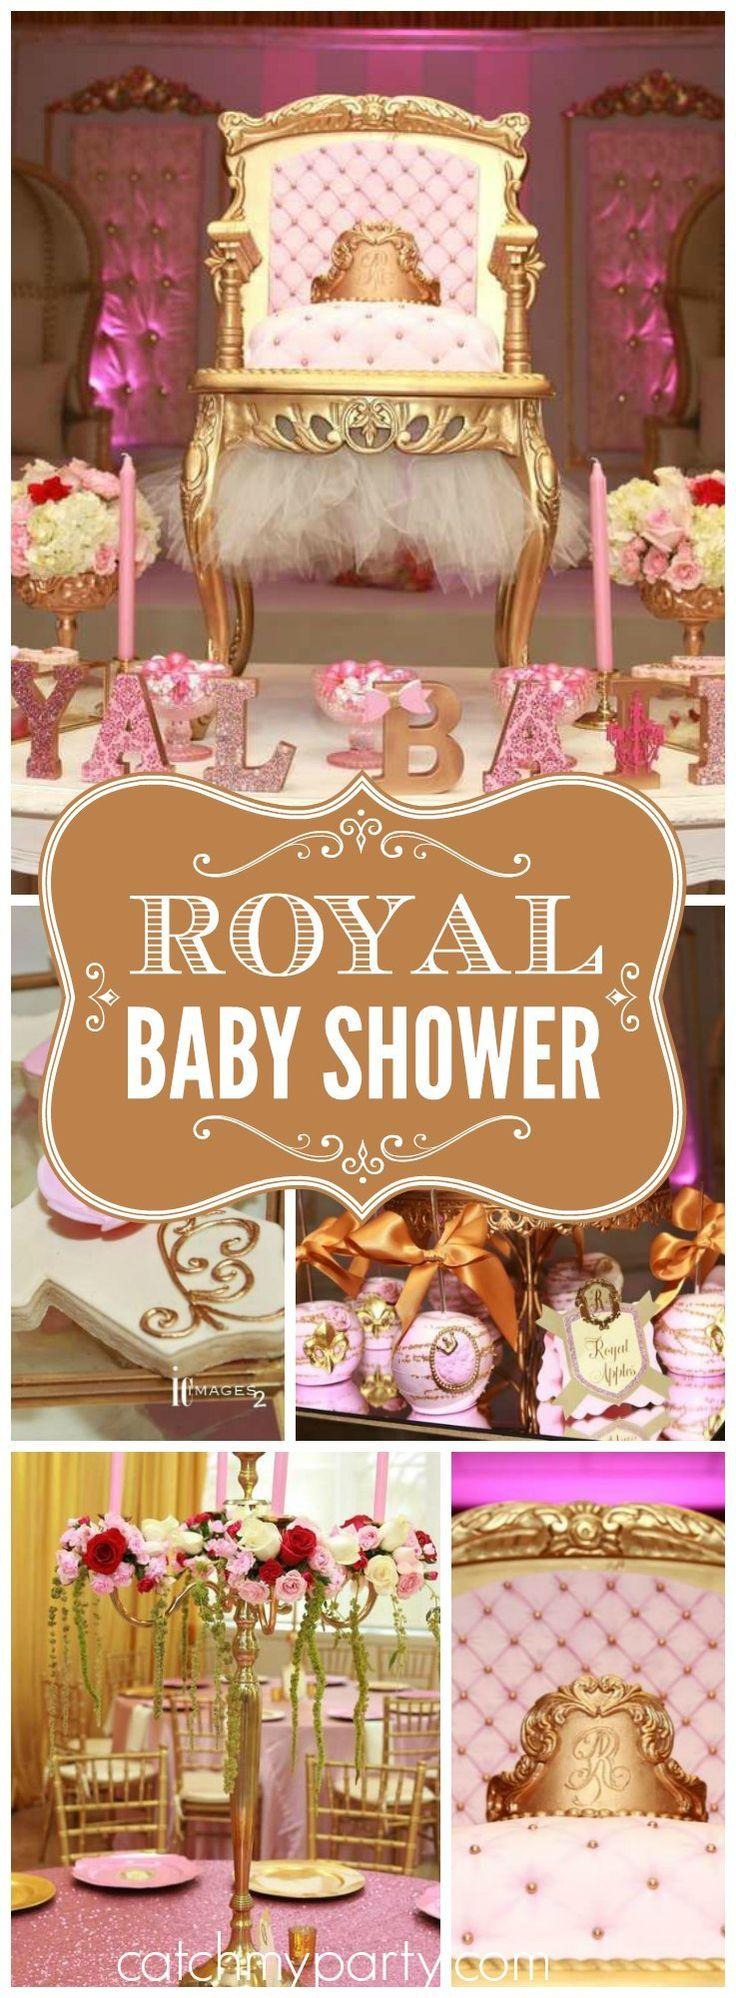 "Royal Baby Shower / Baby Shower ""Princess Royal Bailey"